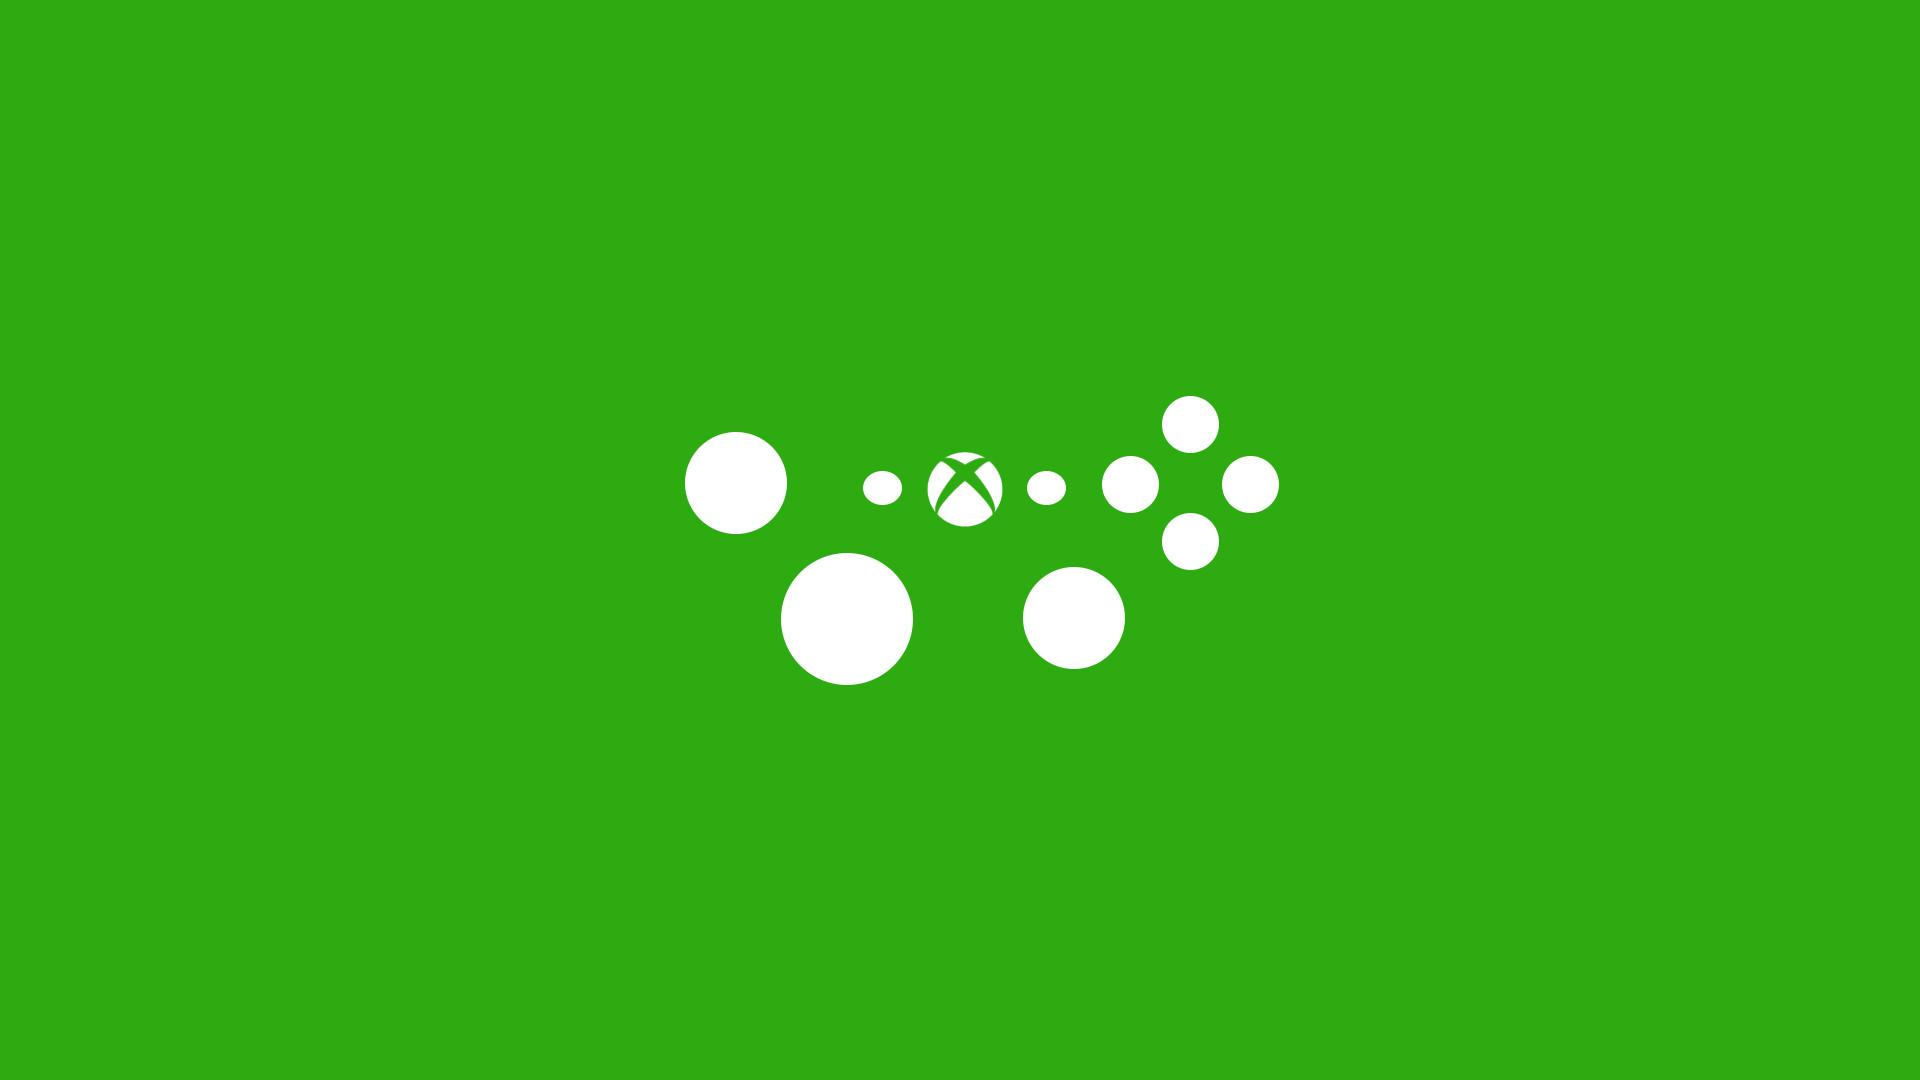 Xbox one wallpaper resolution